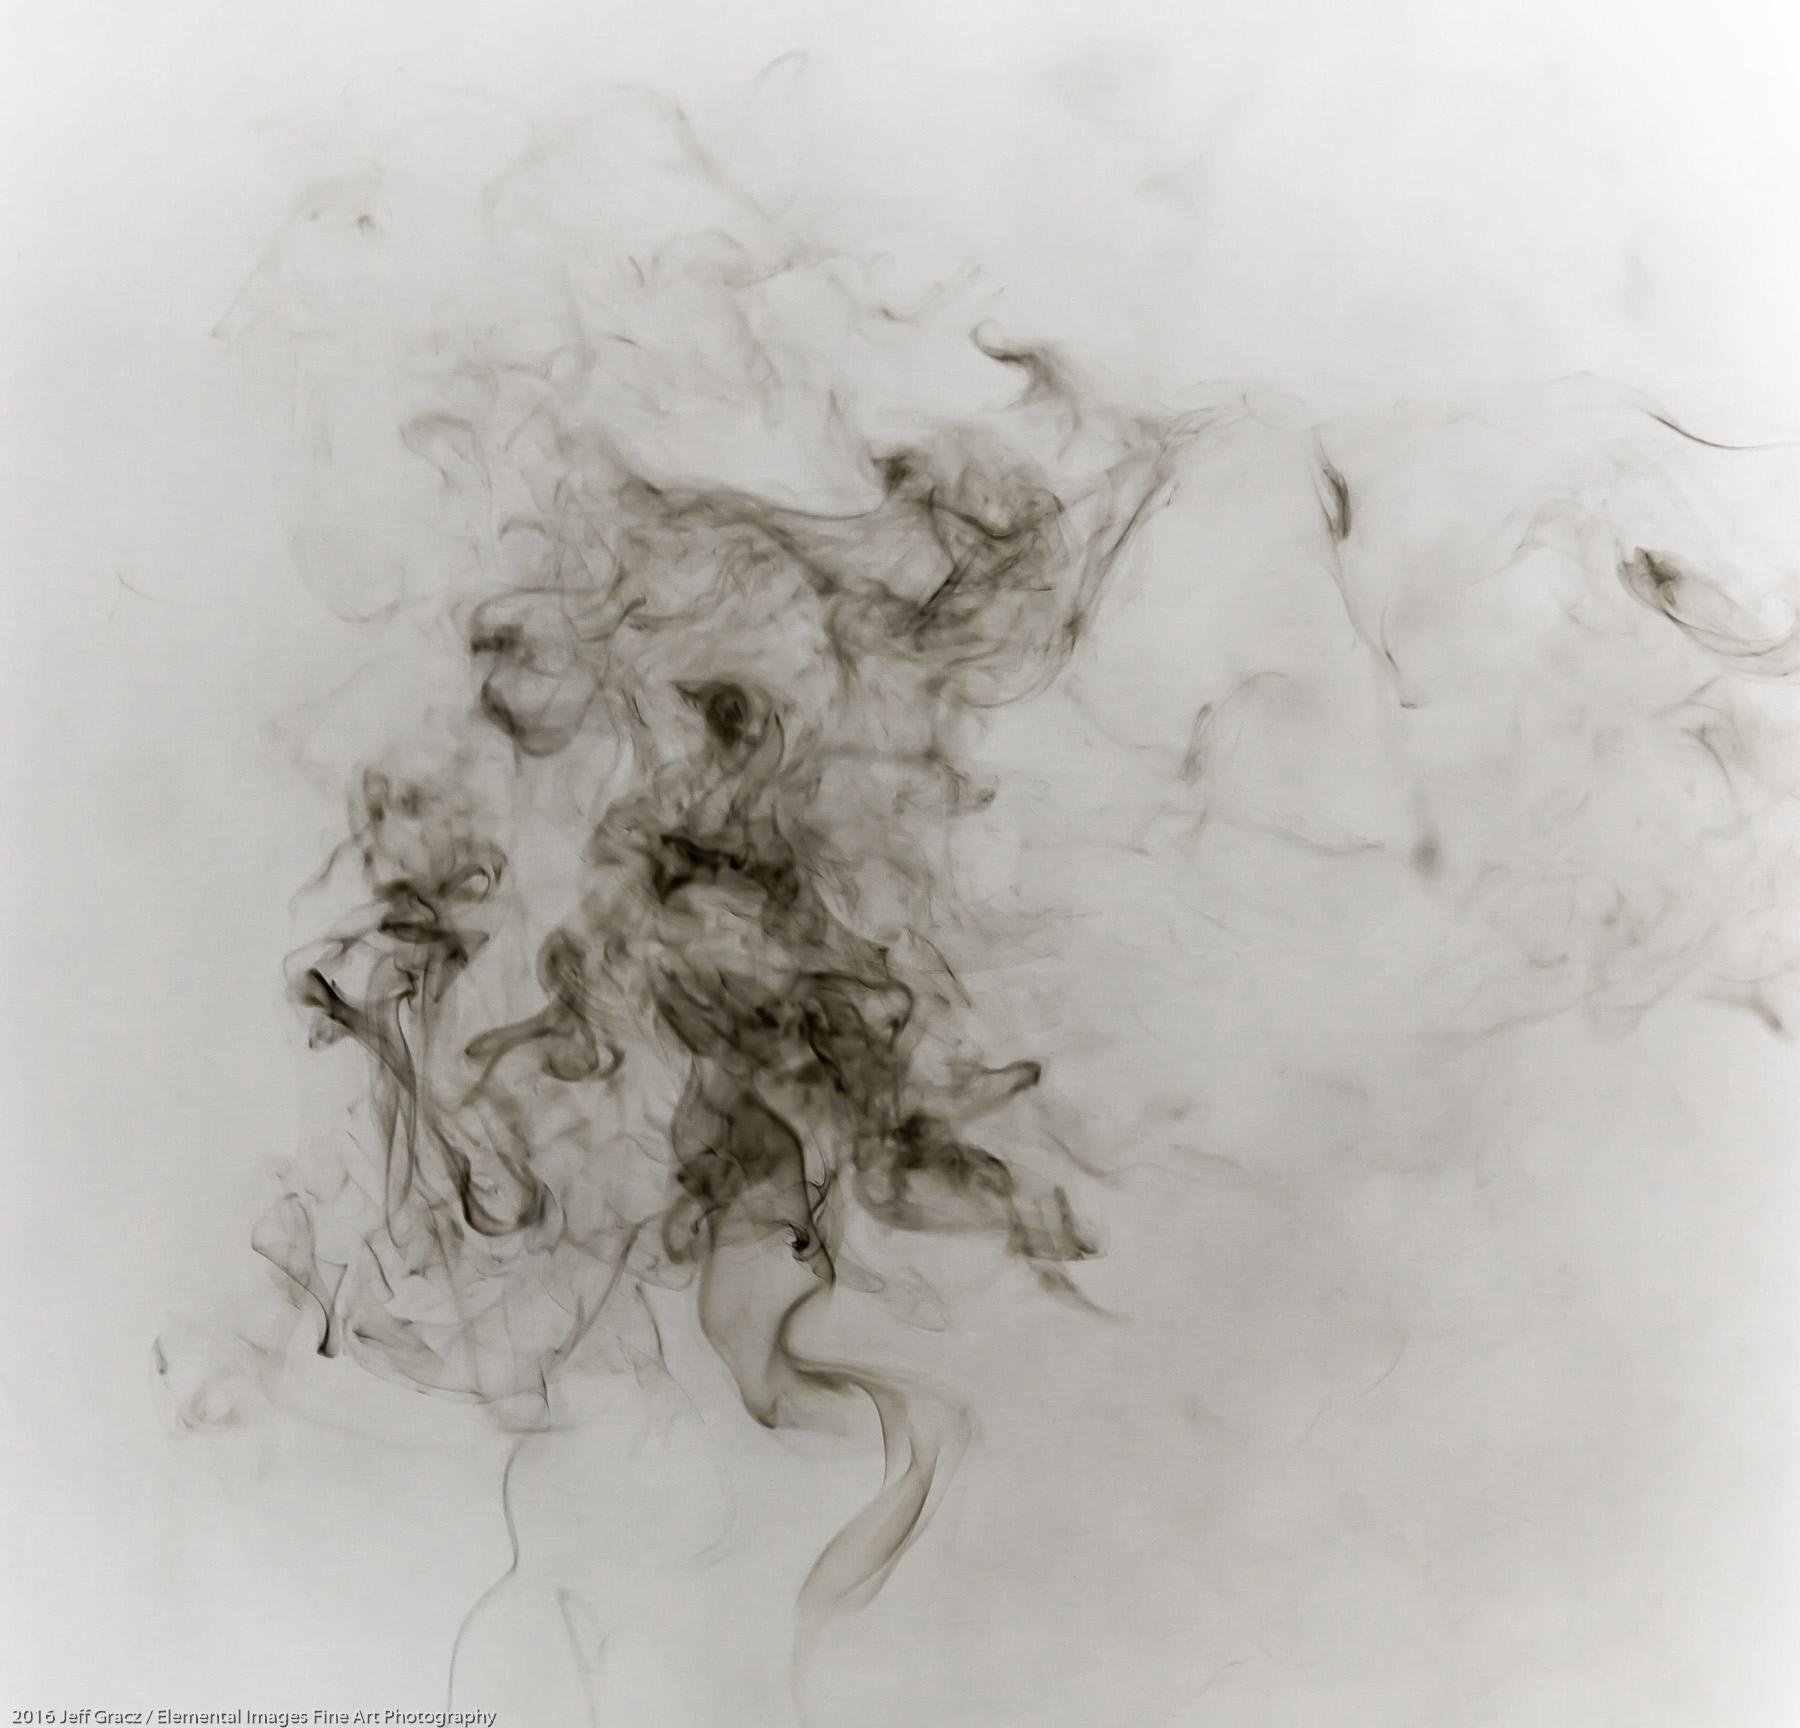 Smoke 9   Vancouver   WA   USA - © 2016 Jeff Gracz / Elemental Images Fine Art Photography - All Rights Reserved Worldwide